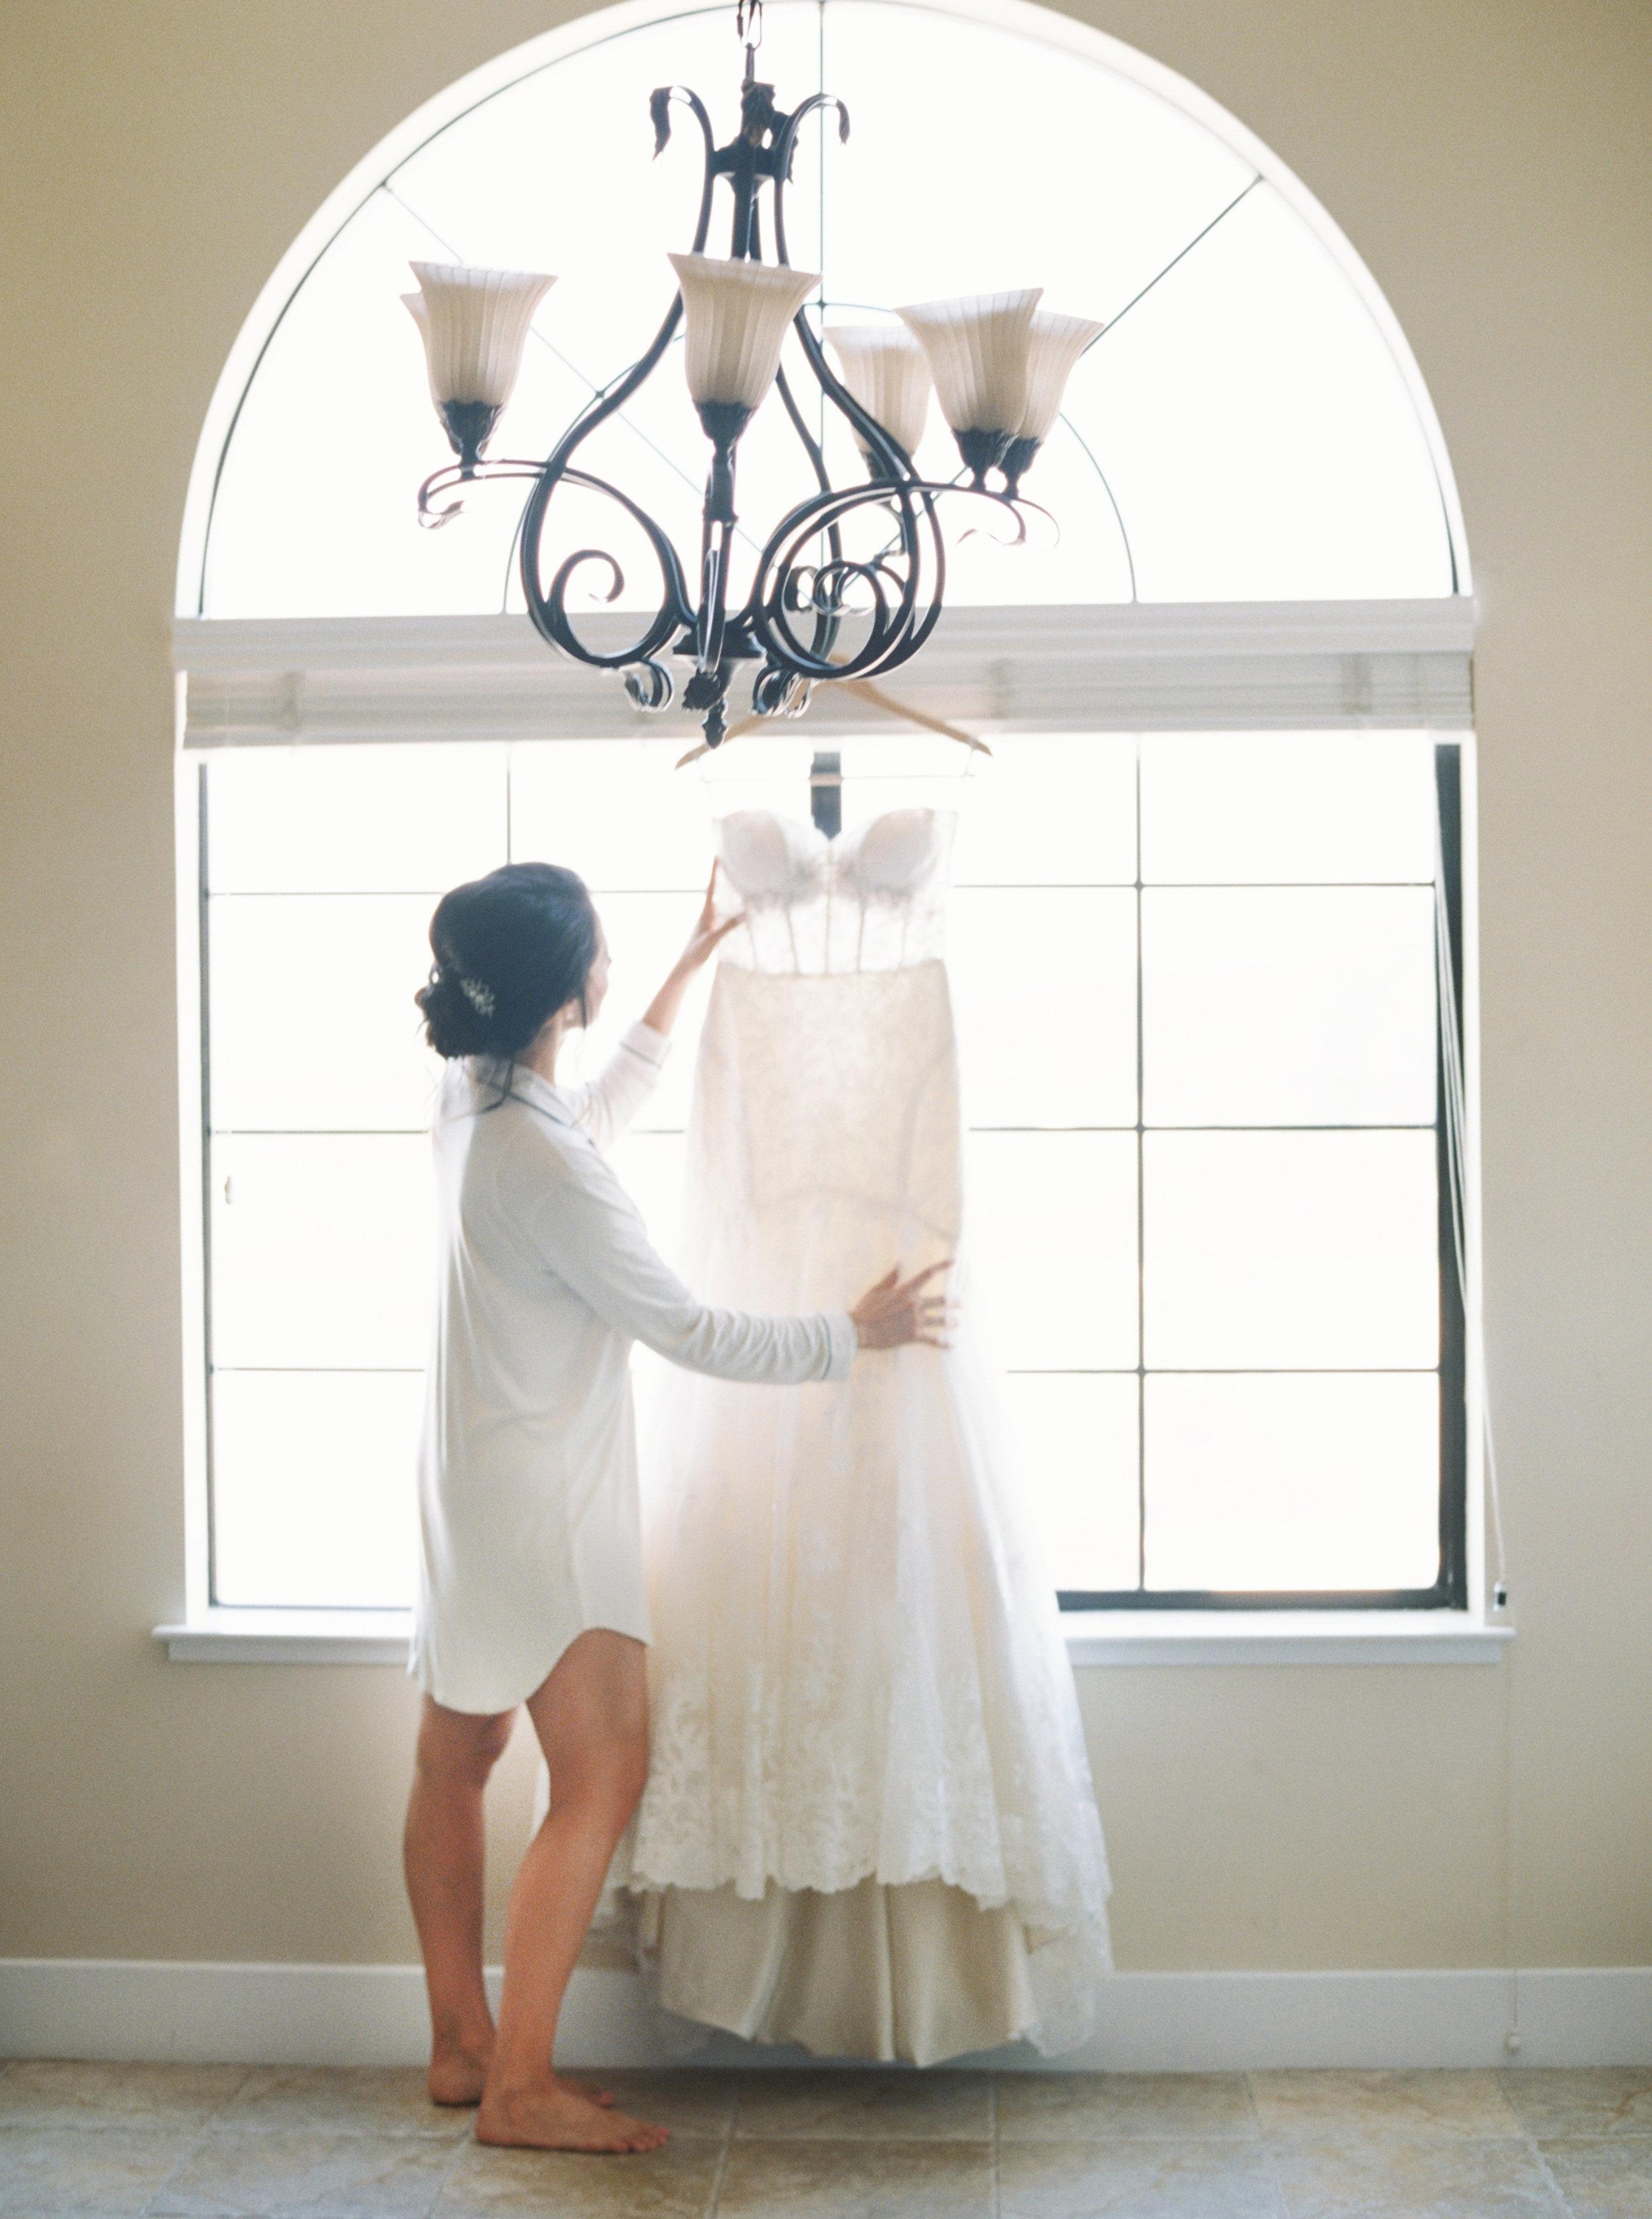 trynhphoto_socal_sf_halfmoon_bay_wedding_photographer_JA-39.jpg